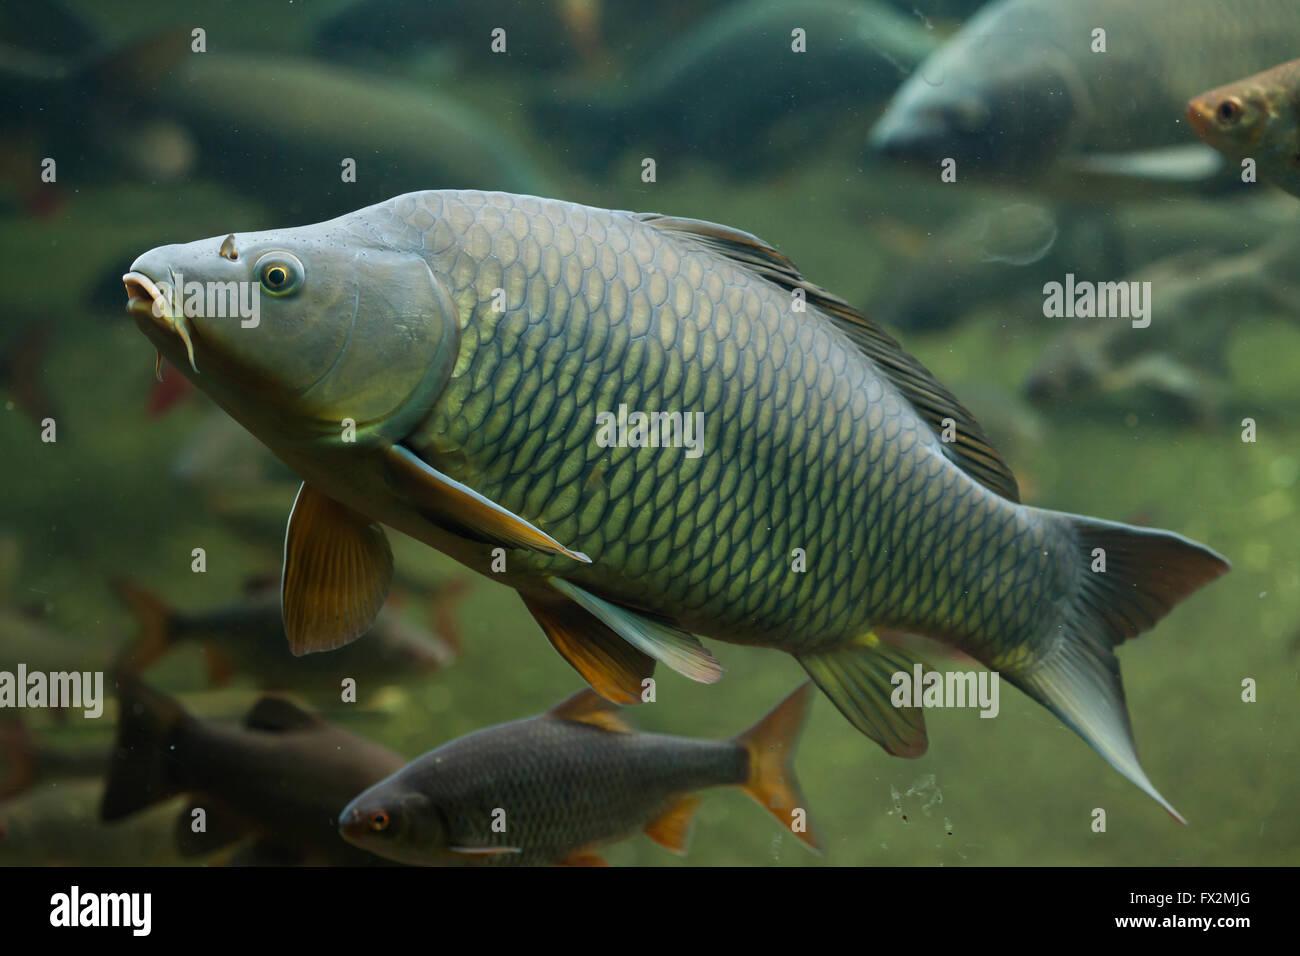 Wild common carp (Cyprinus carpio) at Budapest Zoo in ...